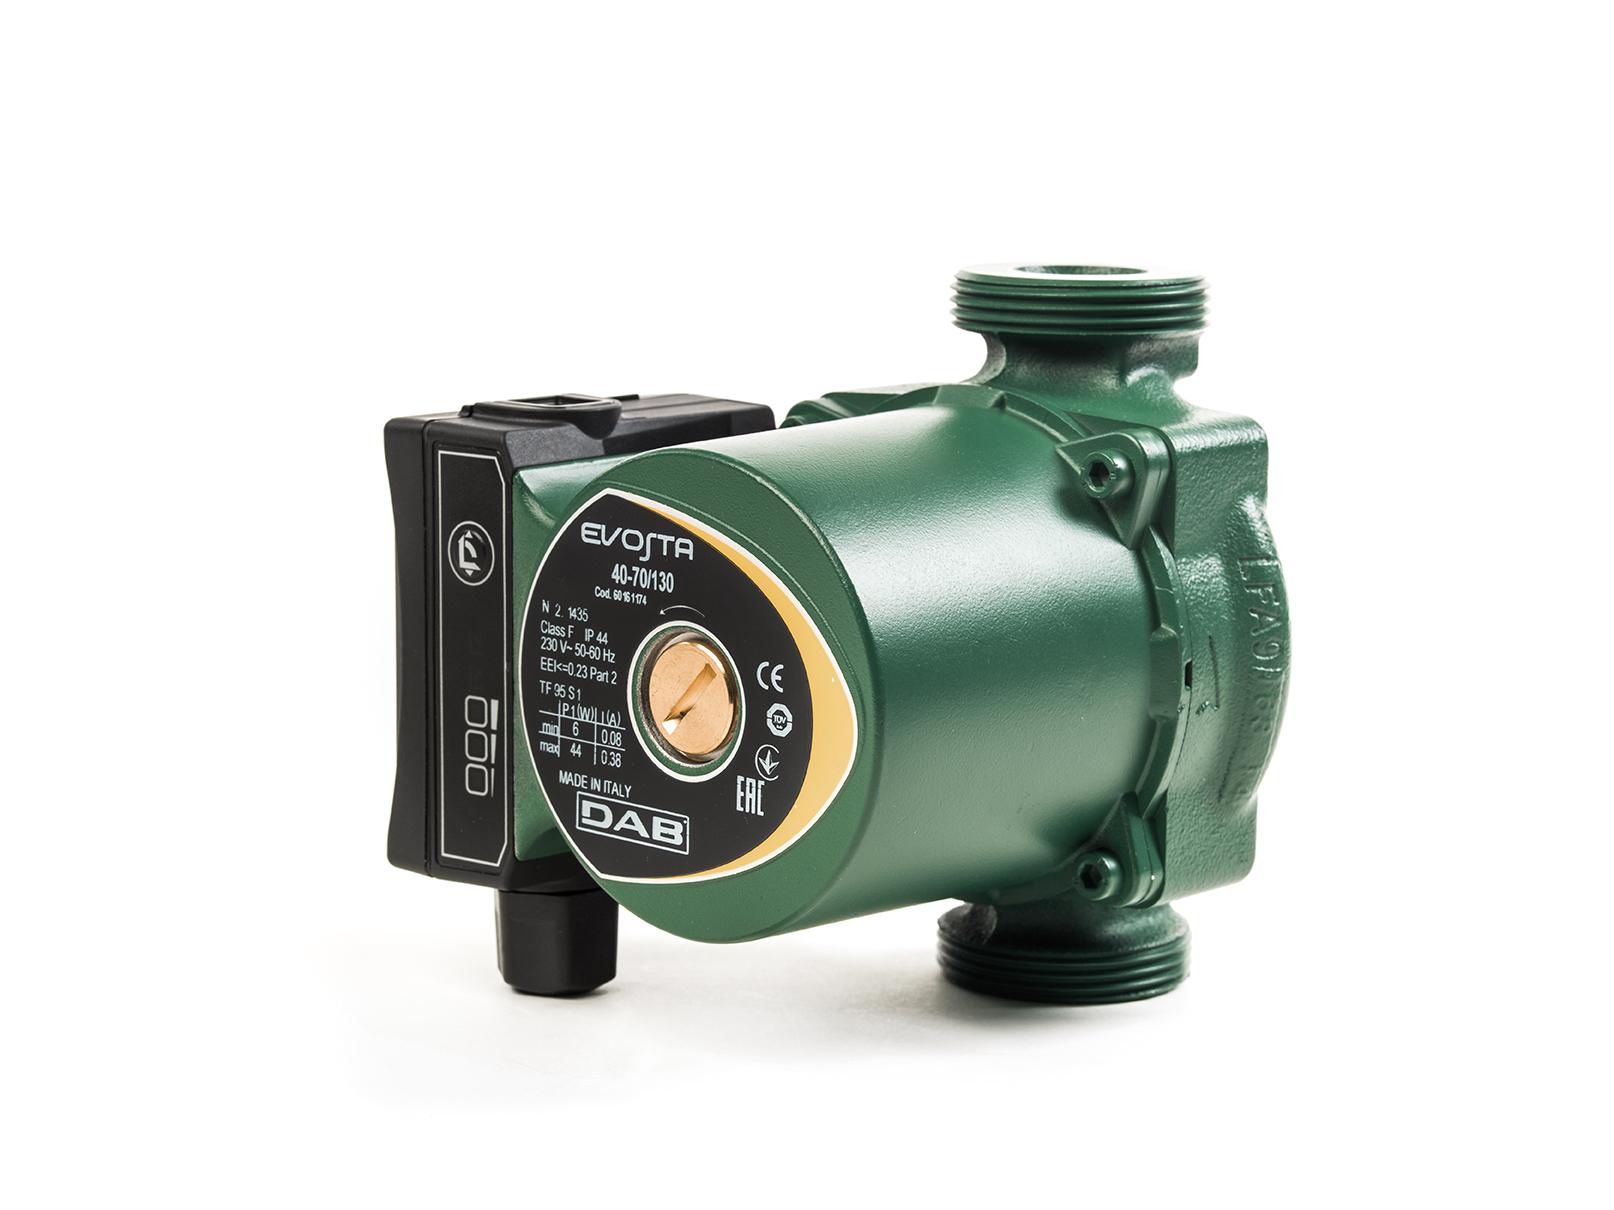 DAB Evosta 40-70/130 Central Heating Circulating Pump